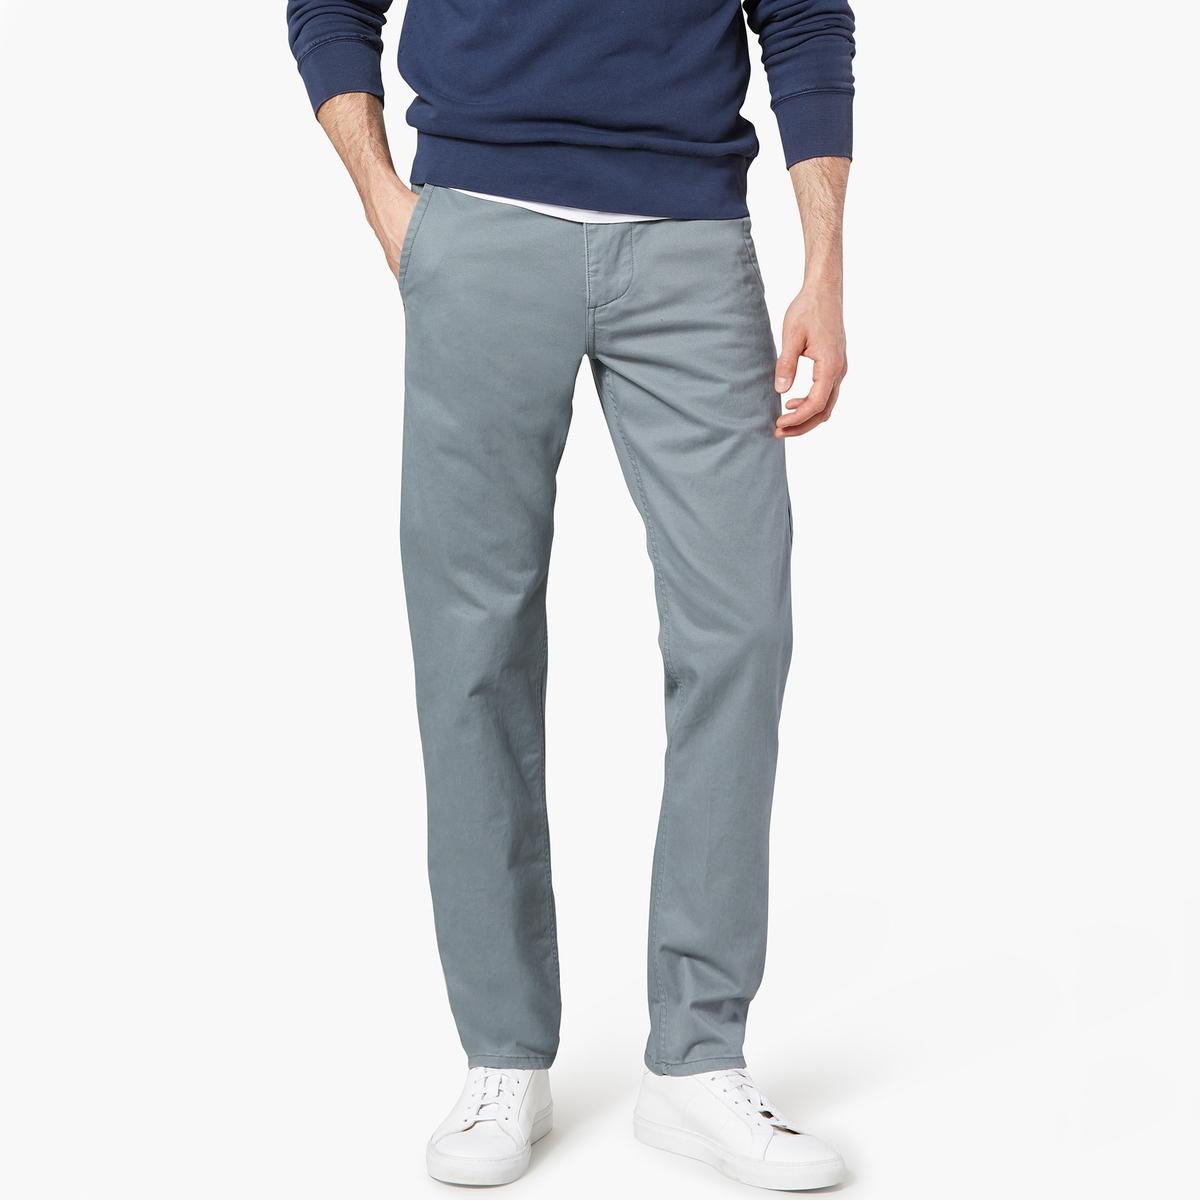 Pantaloni chino slim tapered stretch twill